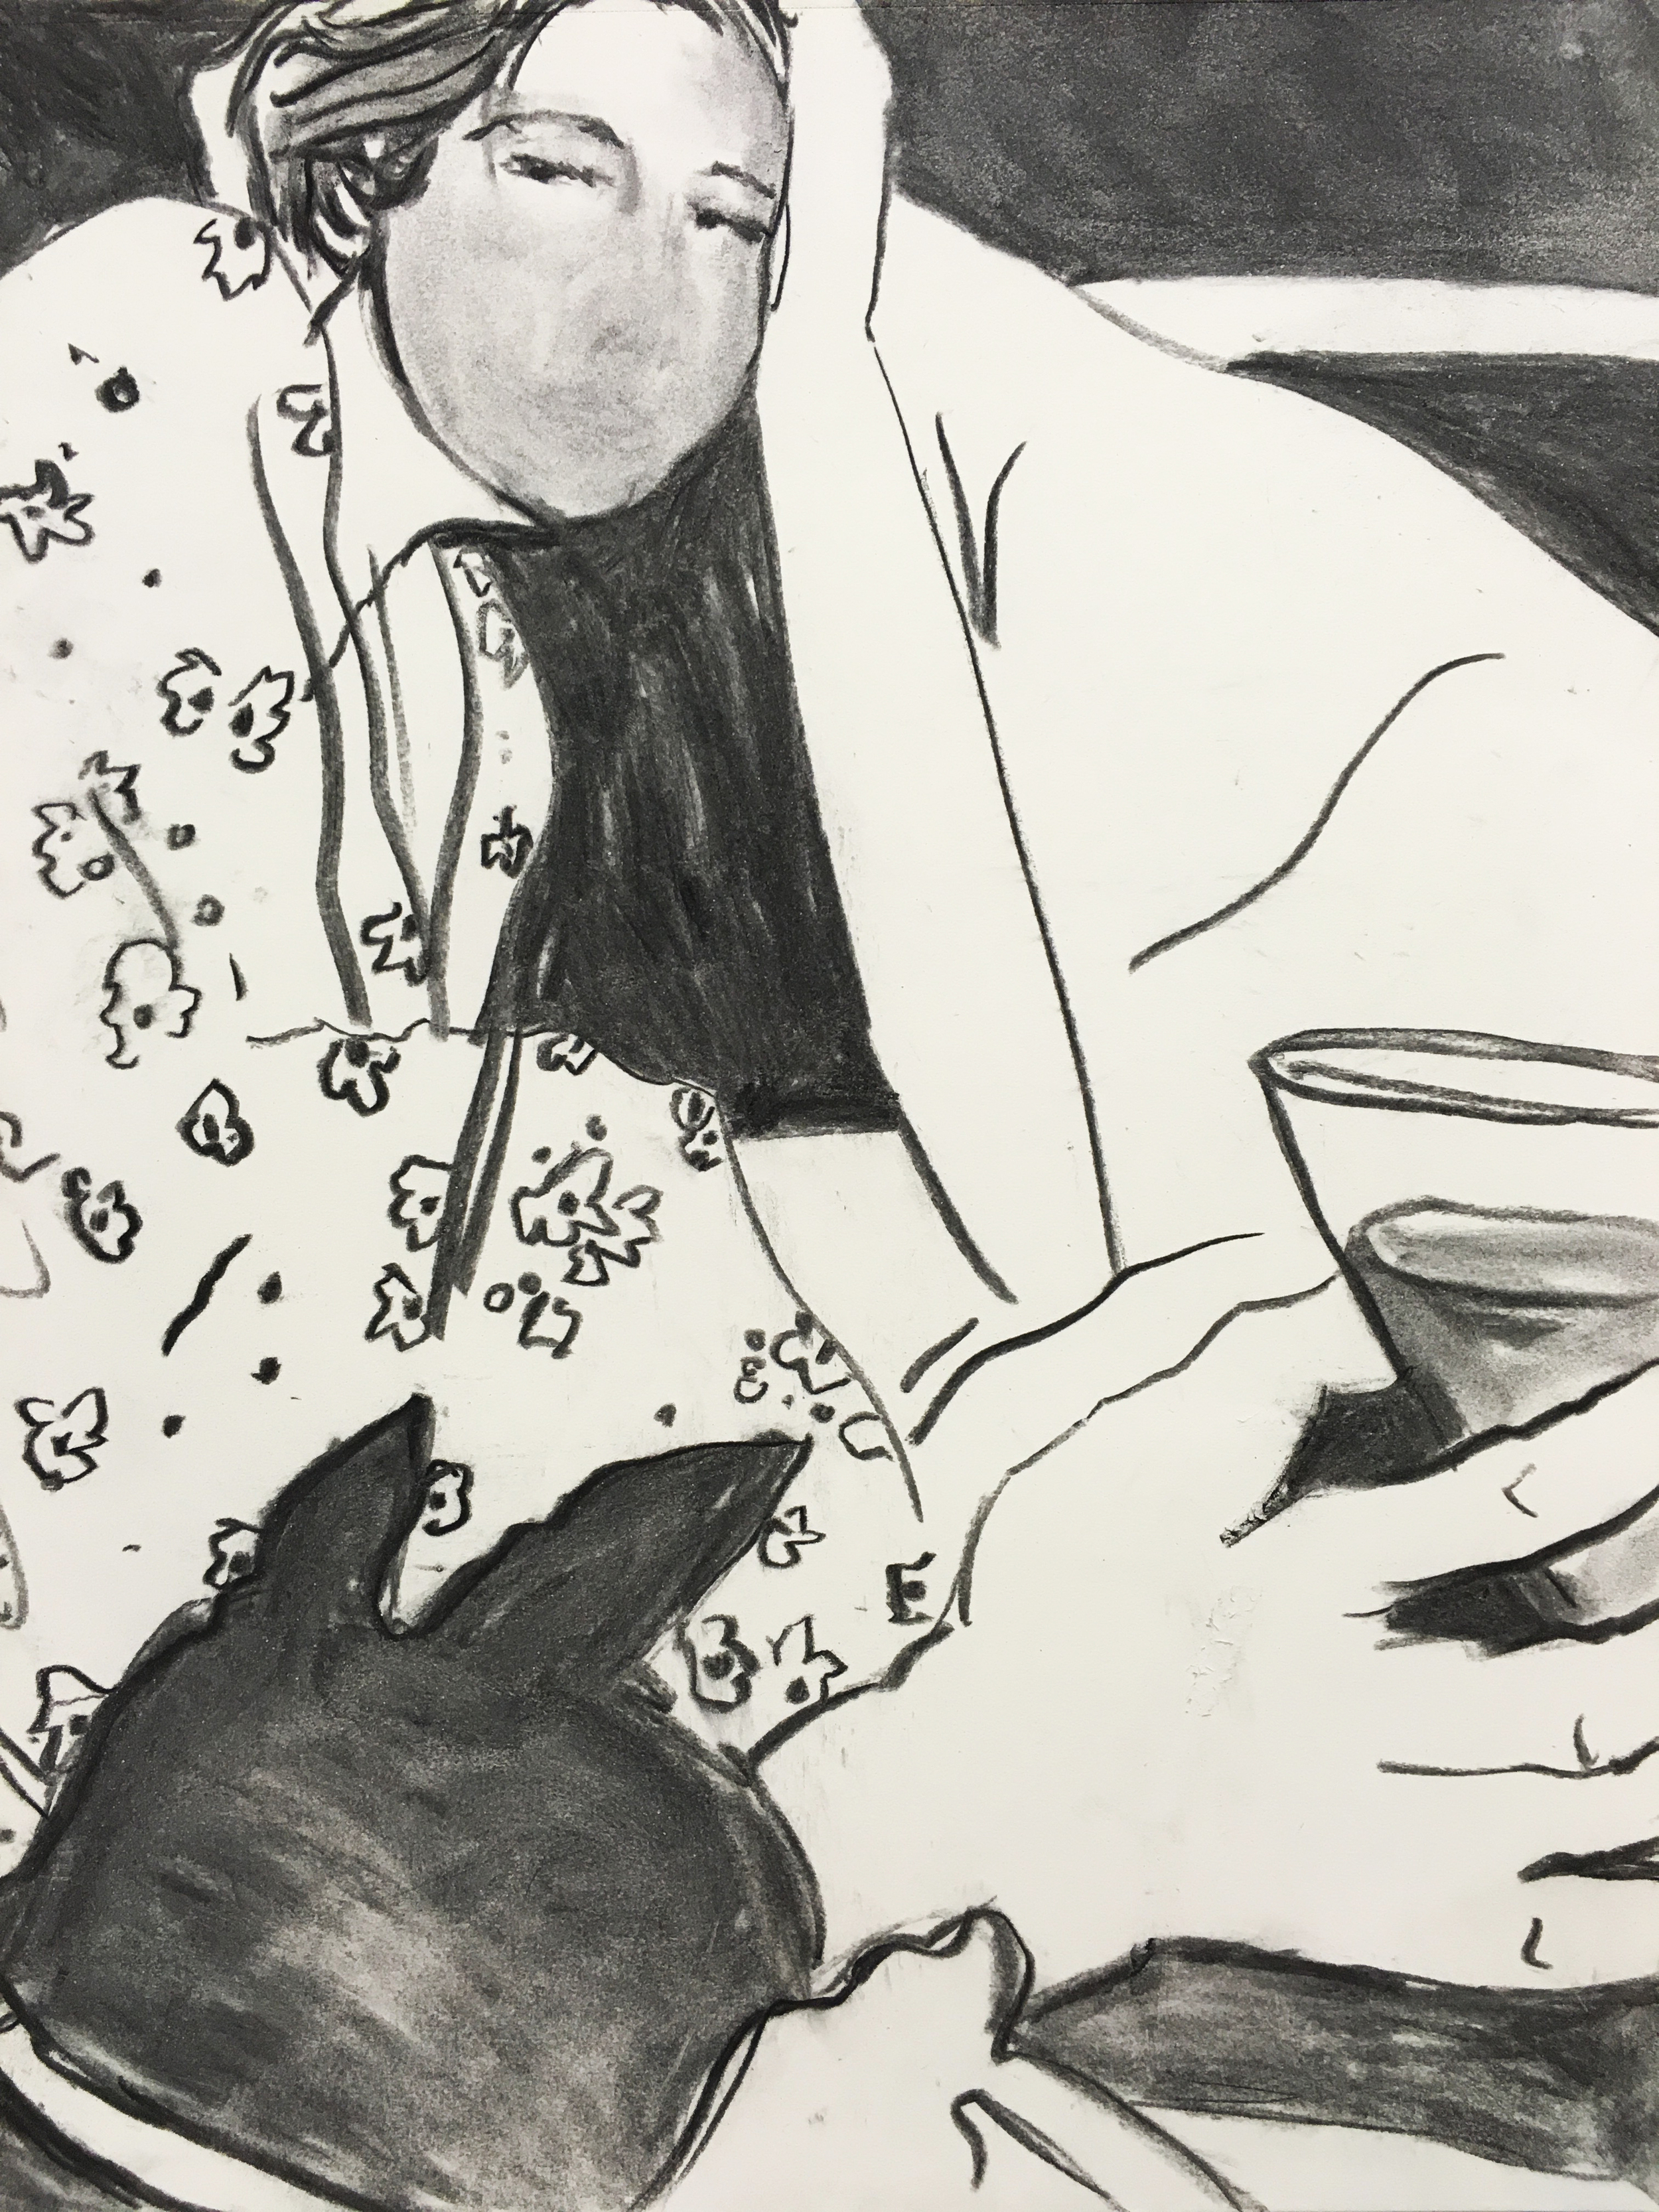 "Nightcap, 16"" x 20"", charcoal on paper, 2015"